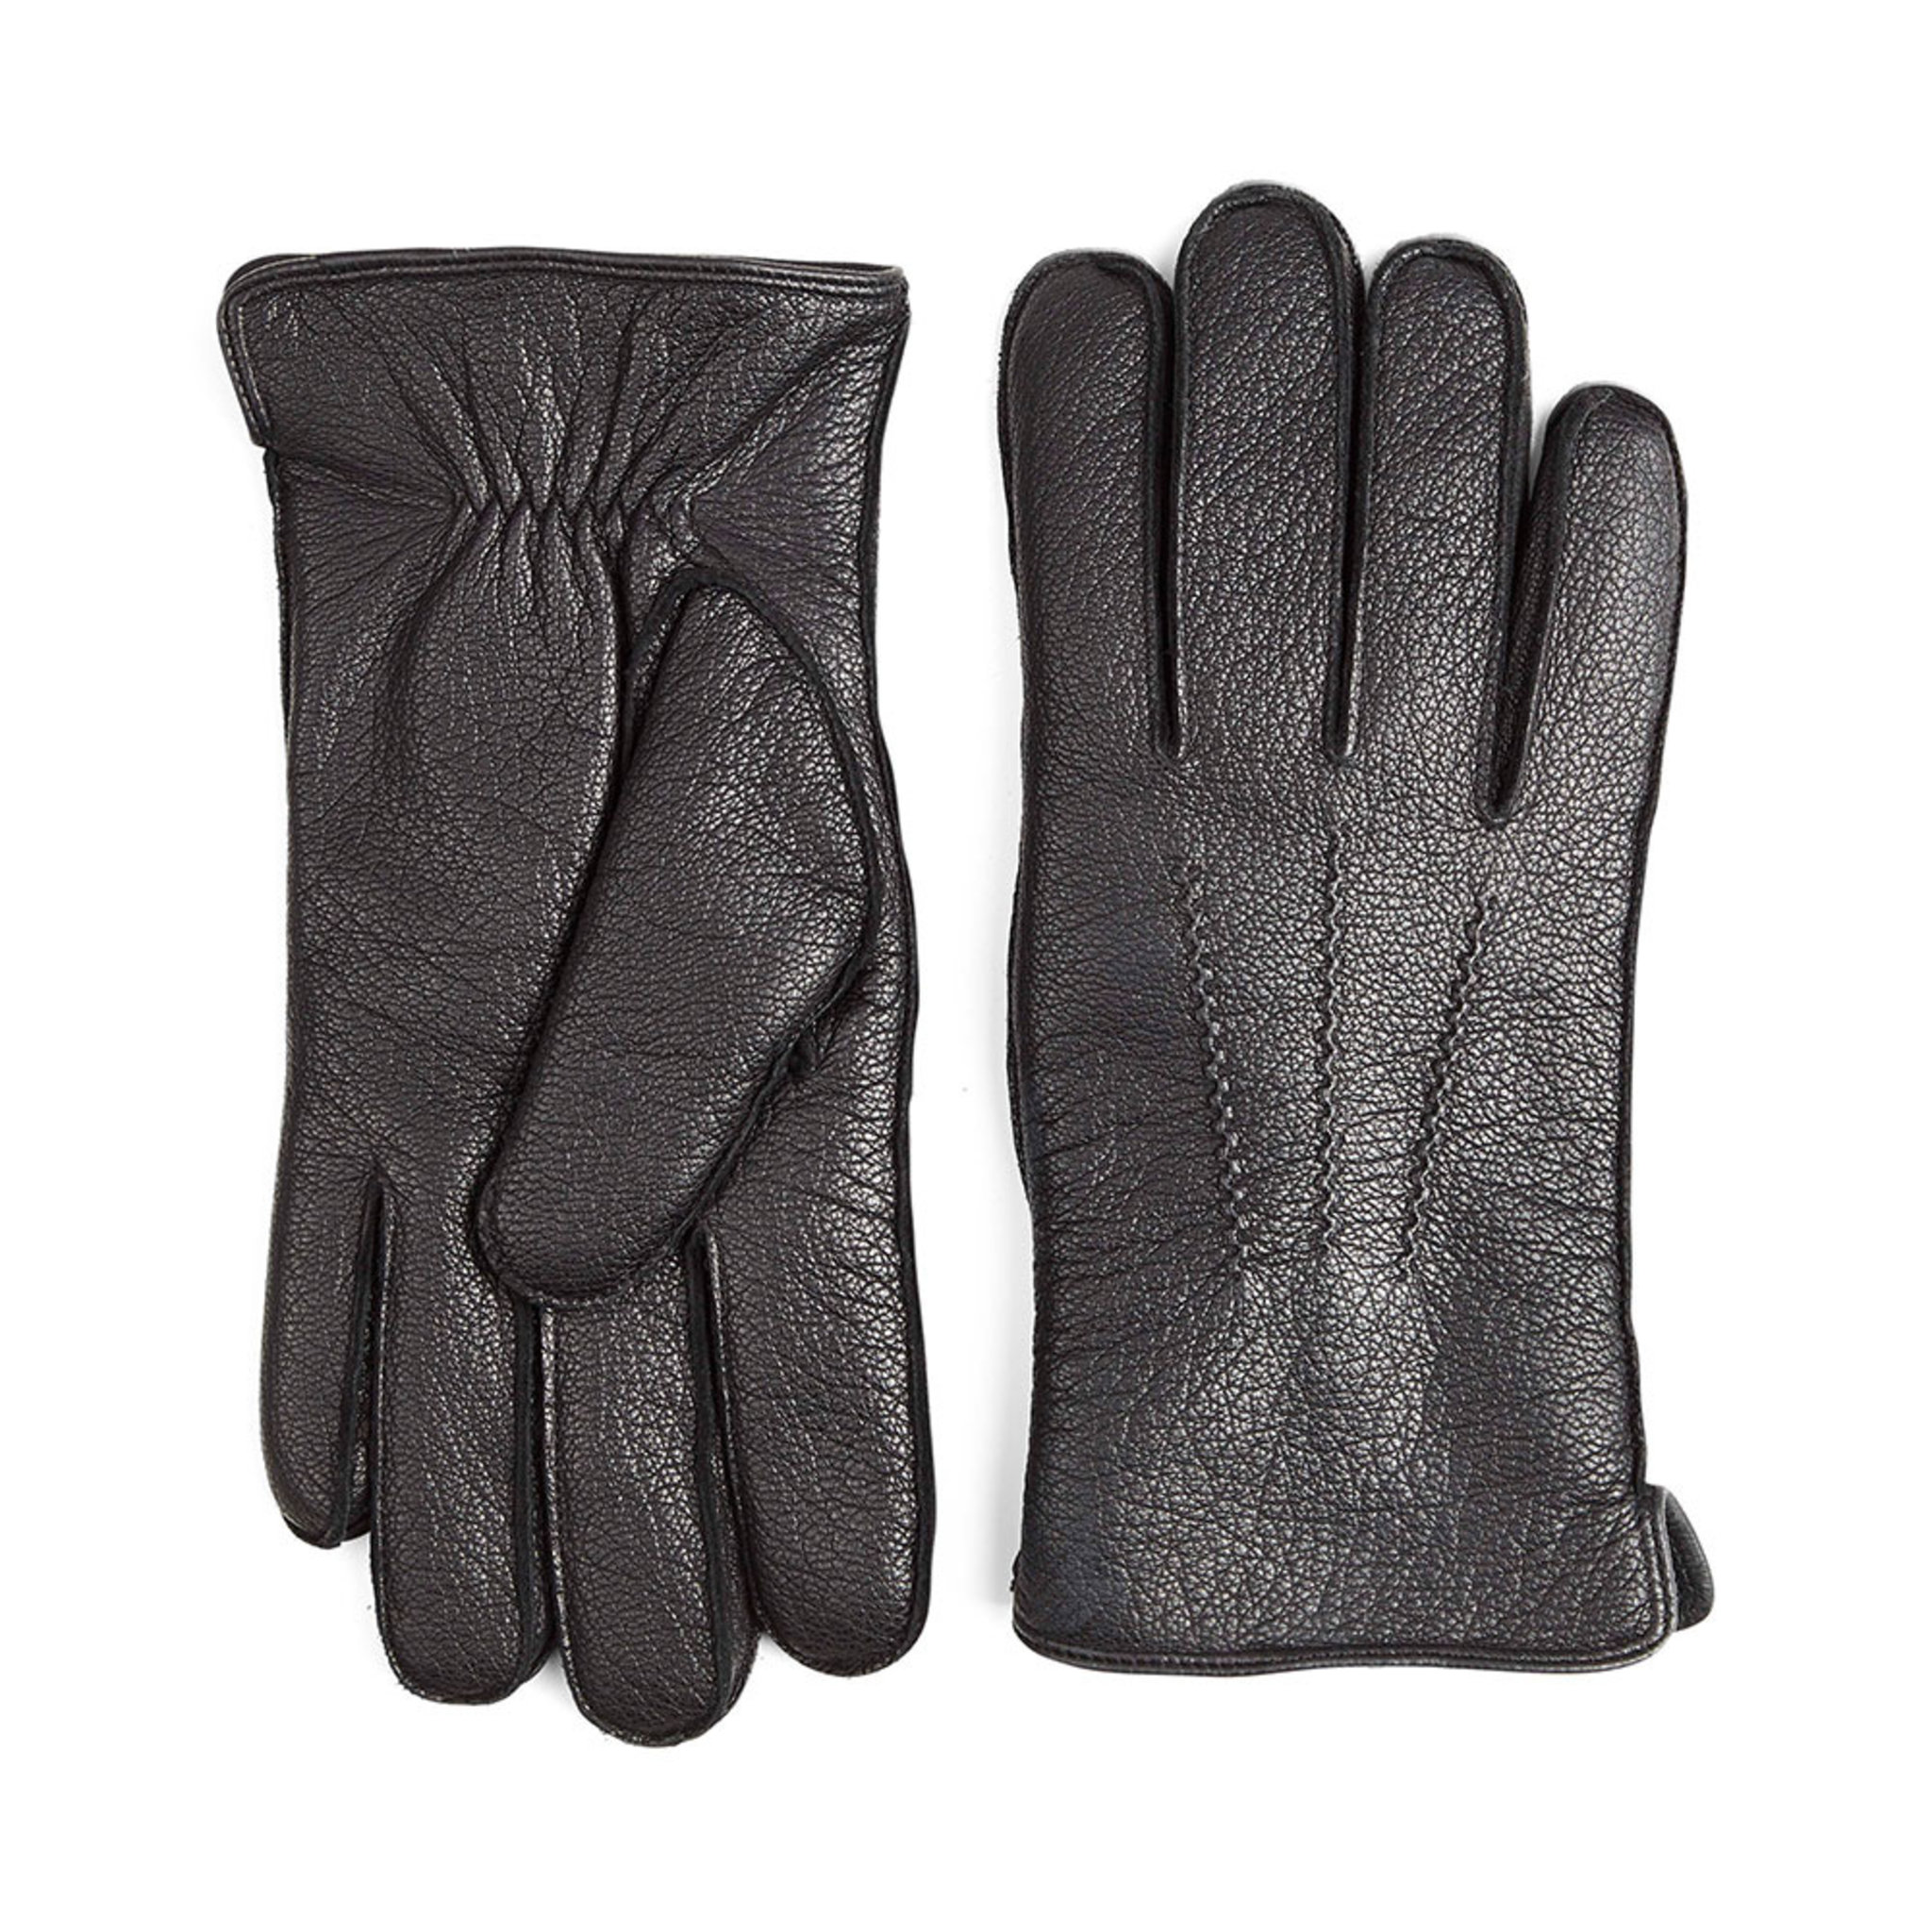 James Glove